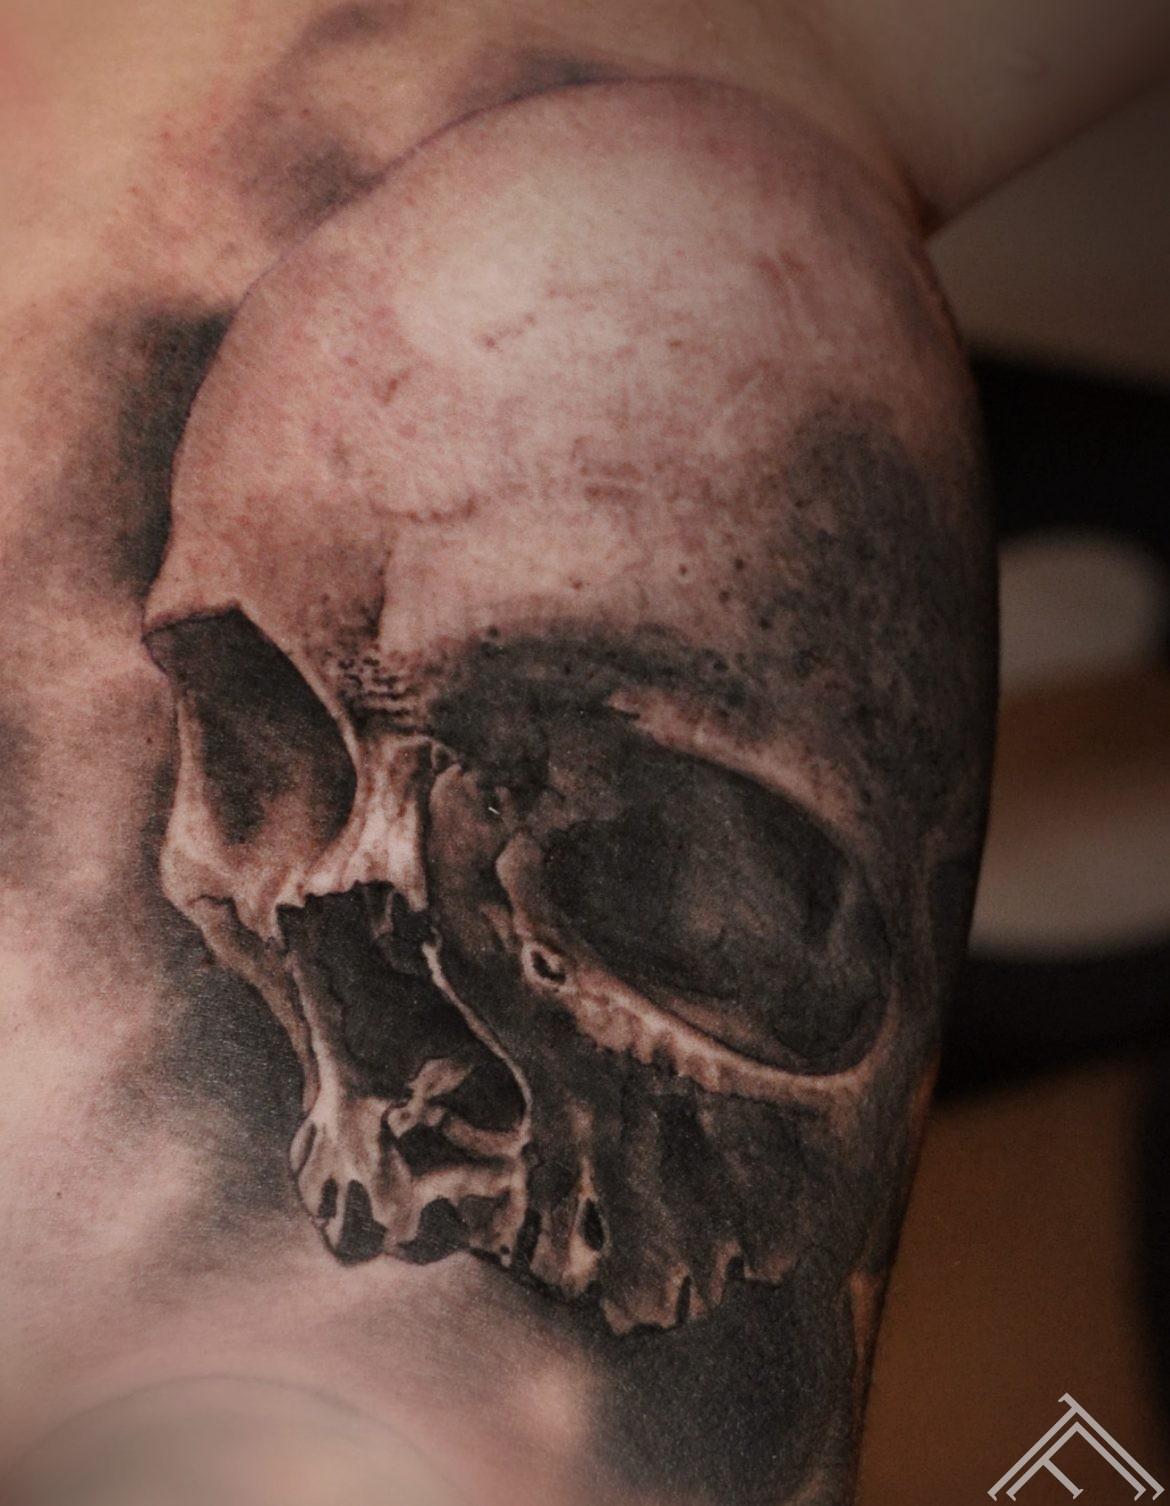 skull-galvaskauss-tattoo-tetovejums-riga-tattoofrequency-art-maksla-marispavlo